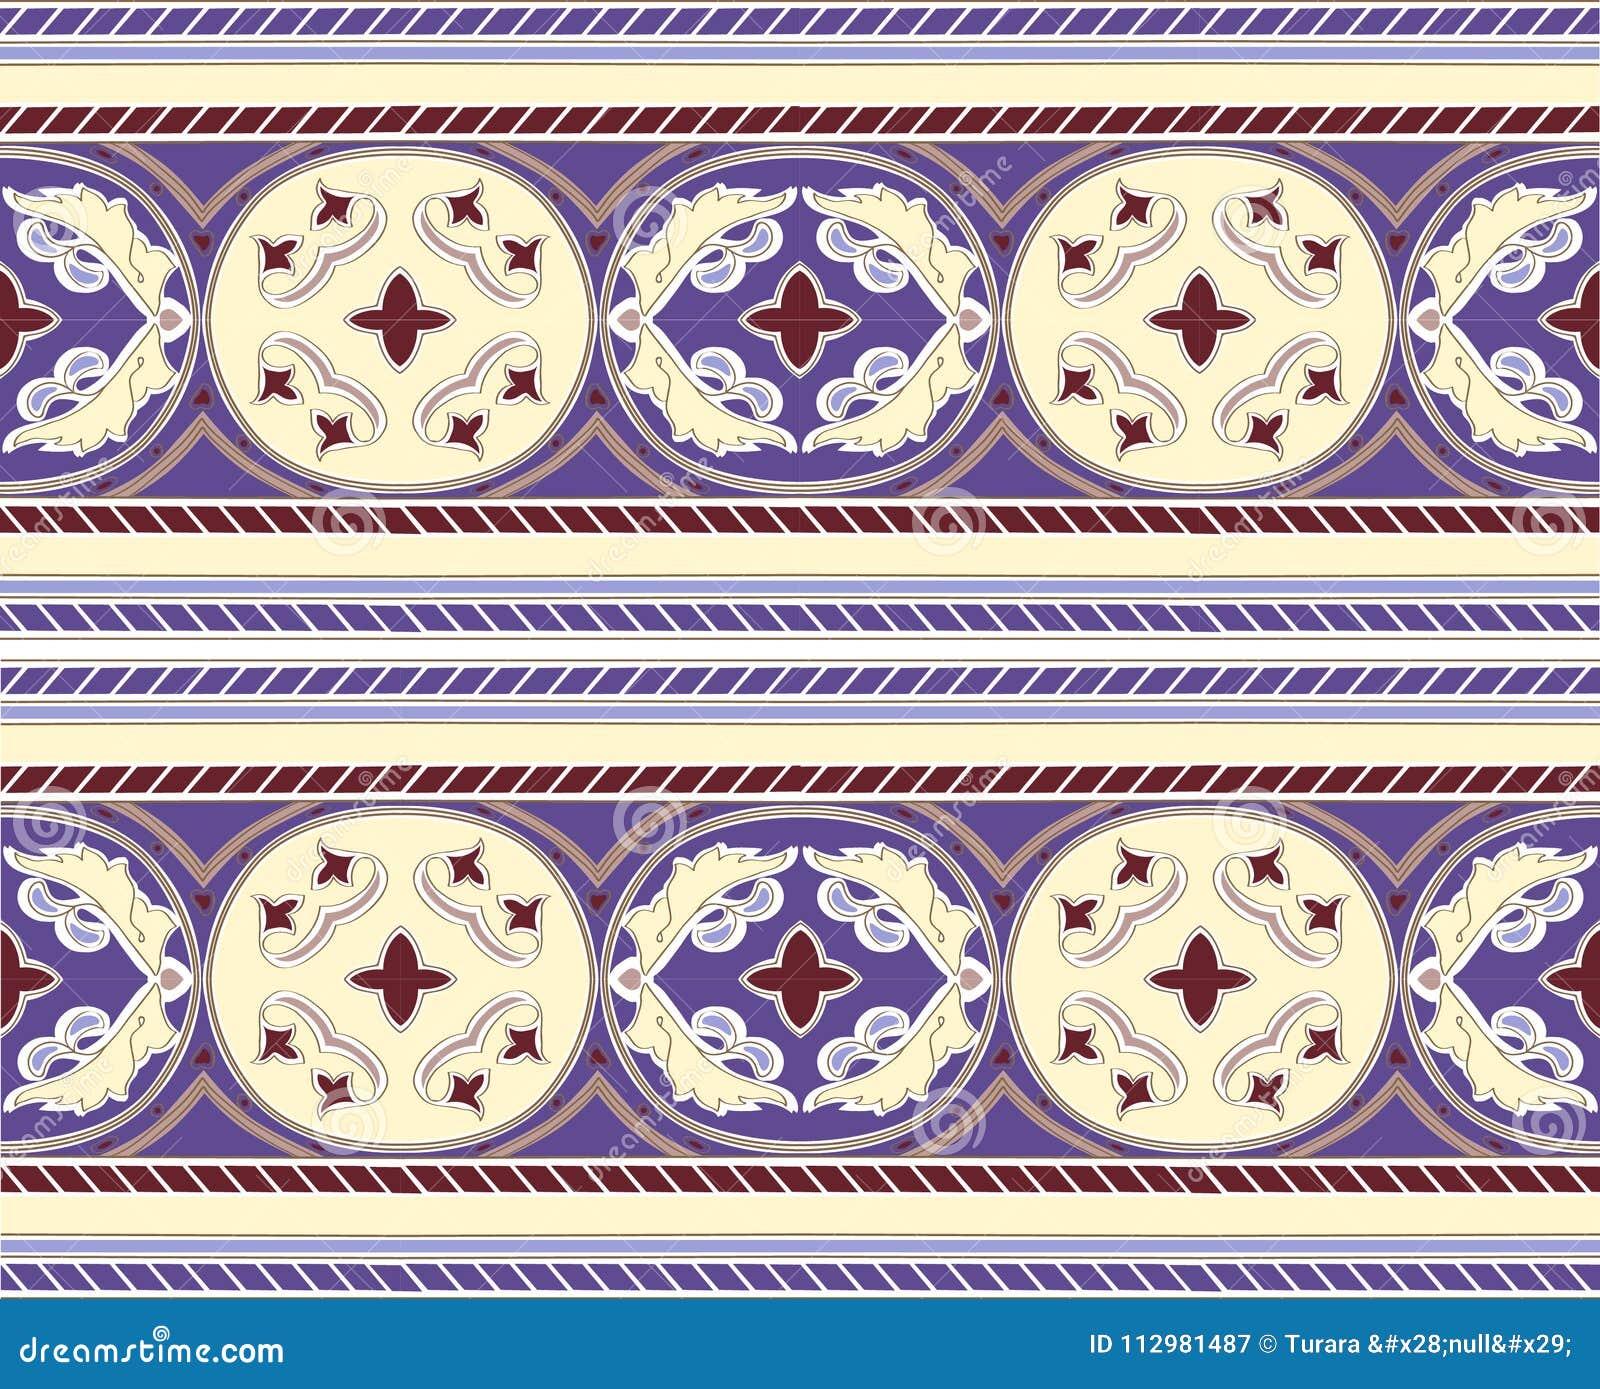 Arabic mosaica vector mosaic pattern